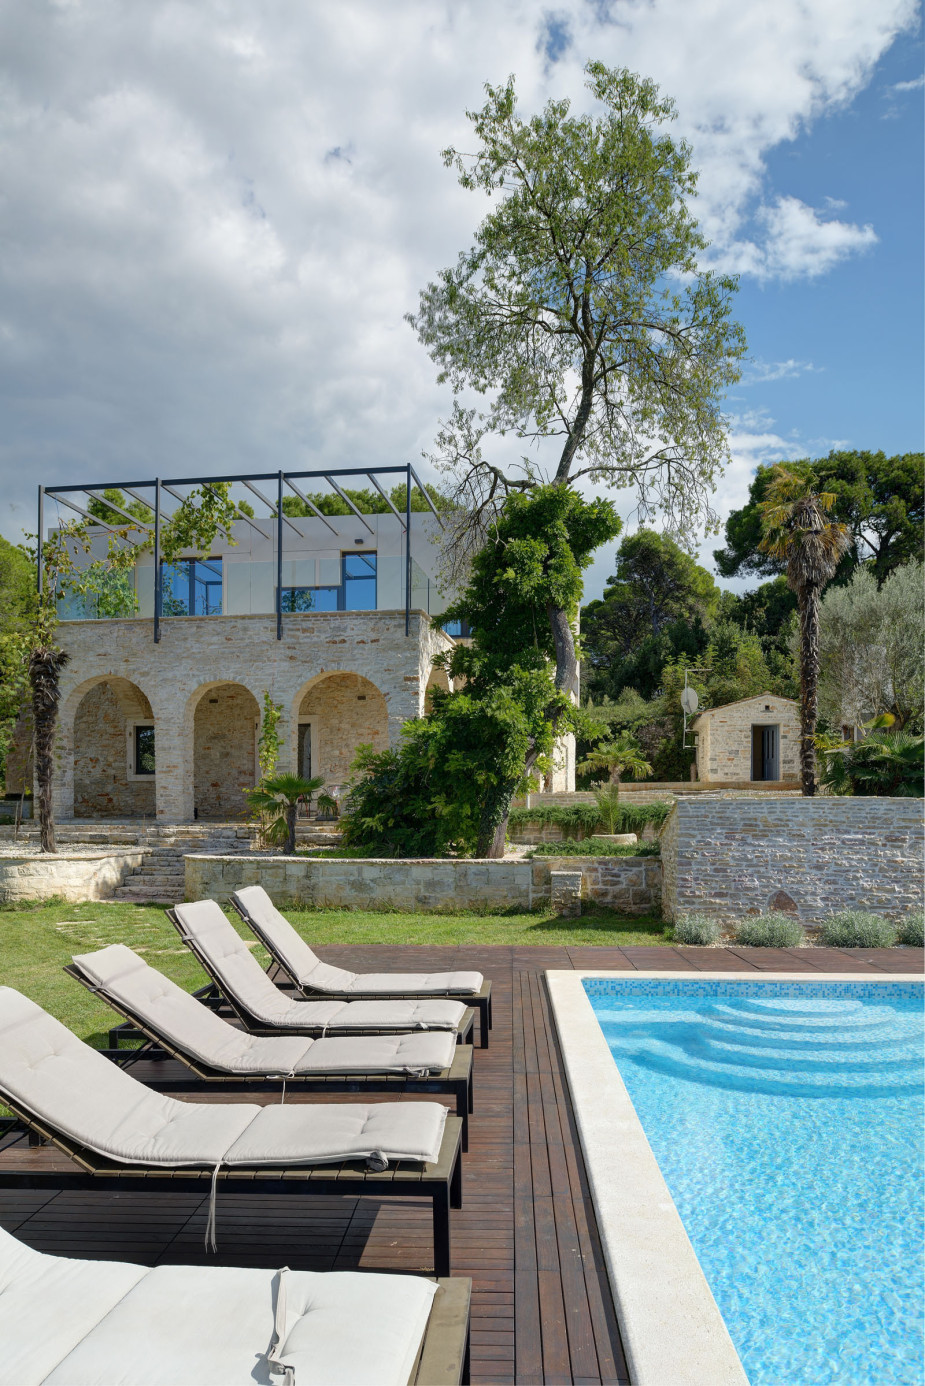 Mediterranean villa in ancient croatian town for Mediterranean villa architecture